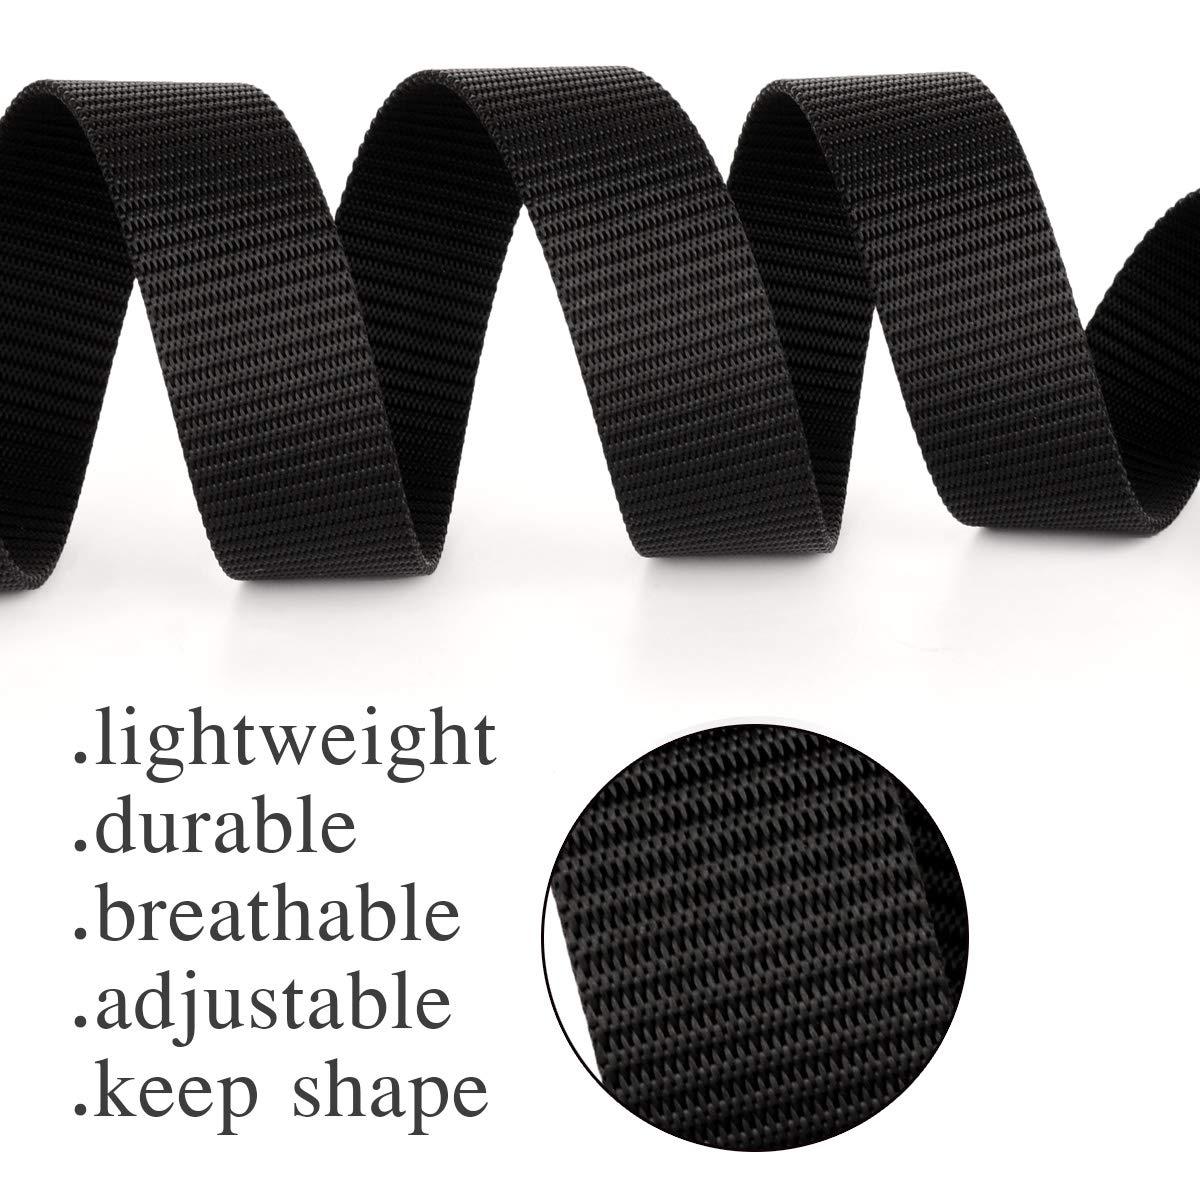 Drizzte Plus Size Belt 47-71 Long 1.25 Wide Mens Black Nylon Adjustable Belt for Dress Pants Loops